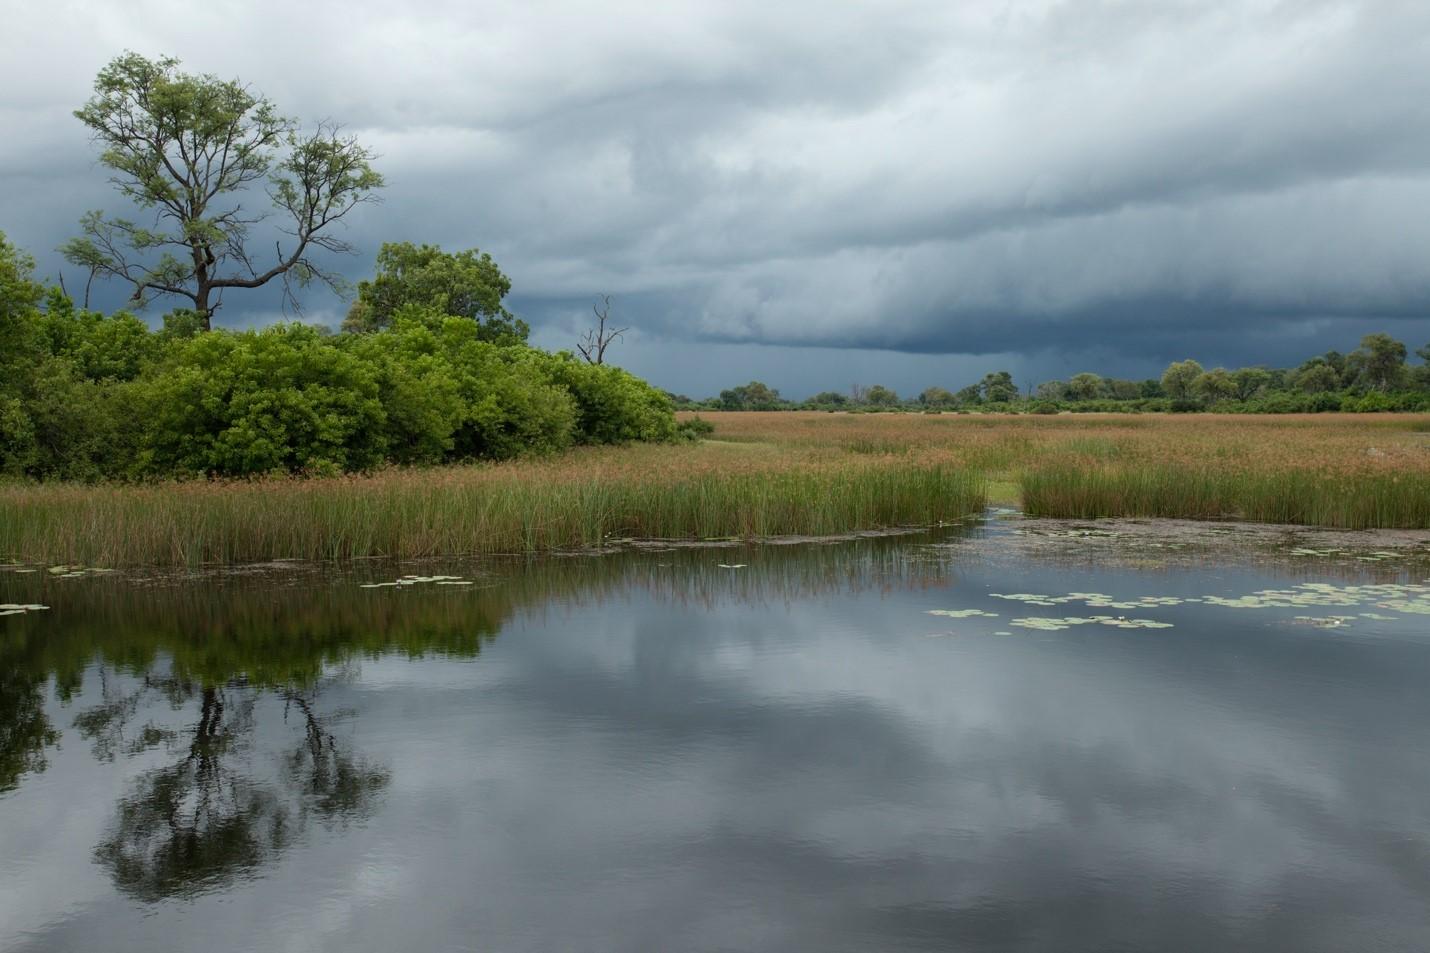 thunderclouds threaten above the okavango delta in botswana